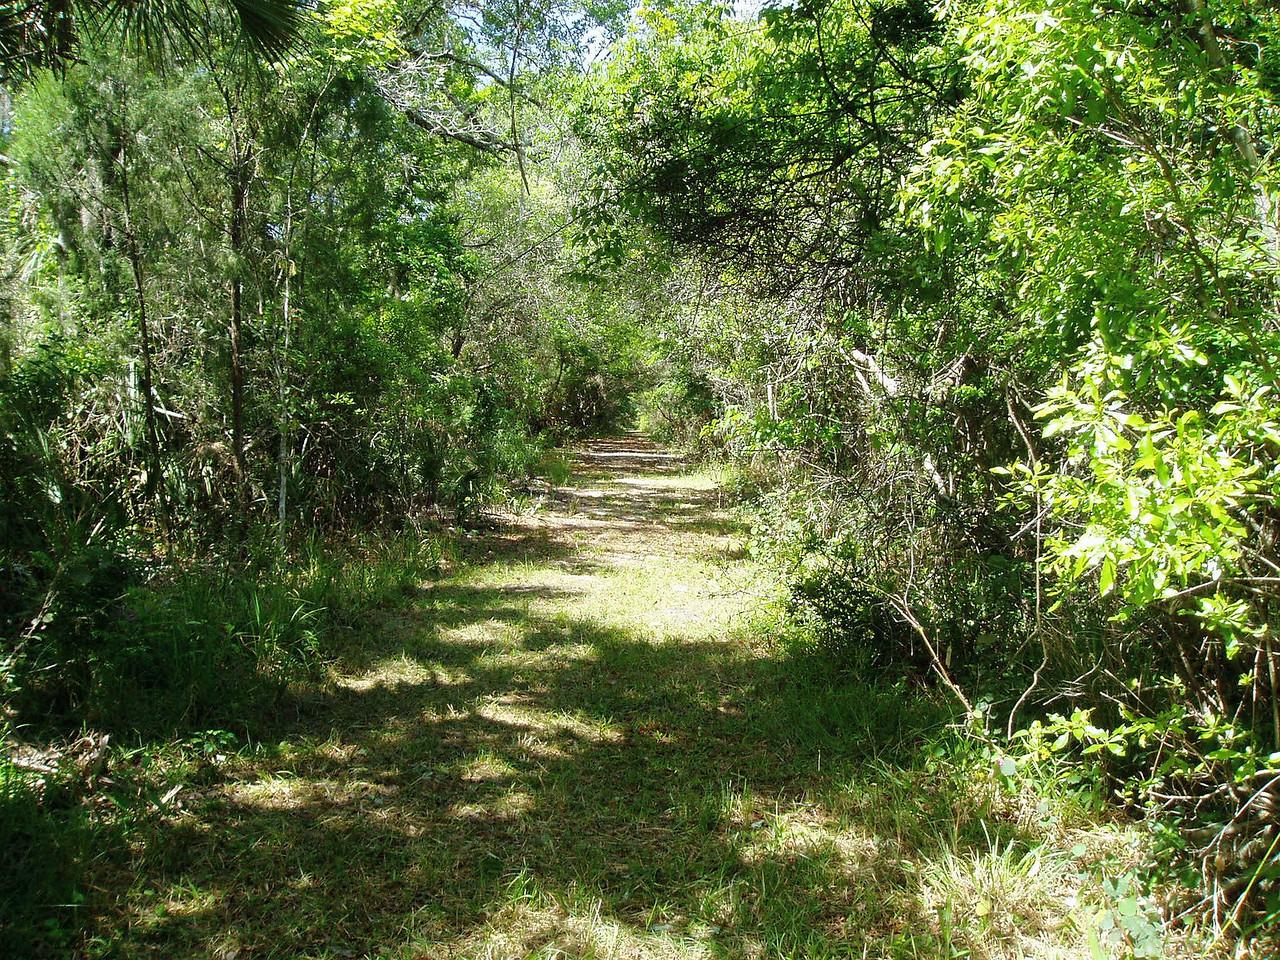 Florida Trail at Orlando Wetlands Park<br /> PHOTO CREDIT: Deb Blick / Florida Trail Association